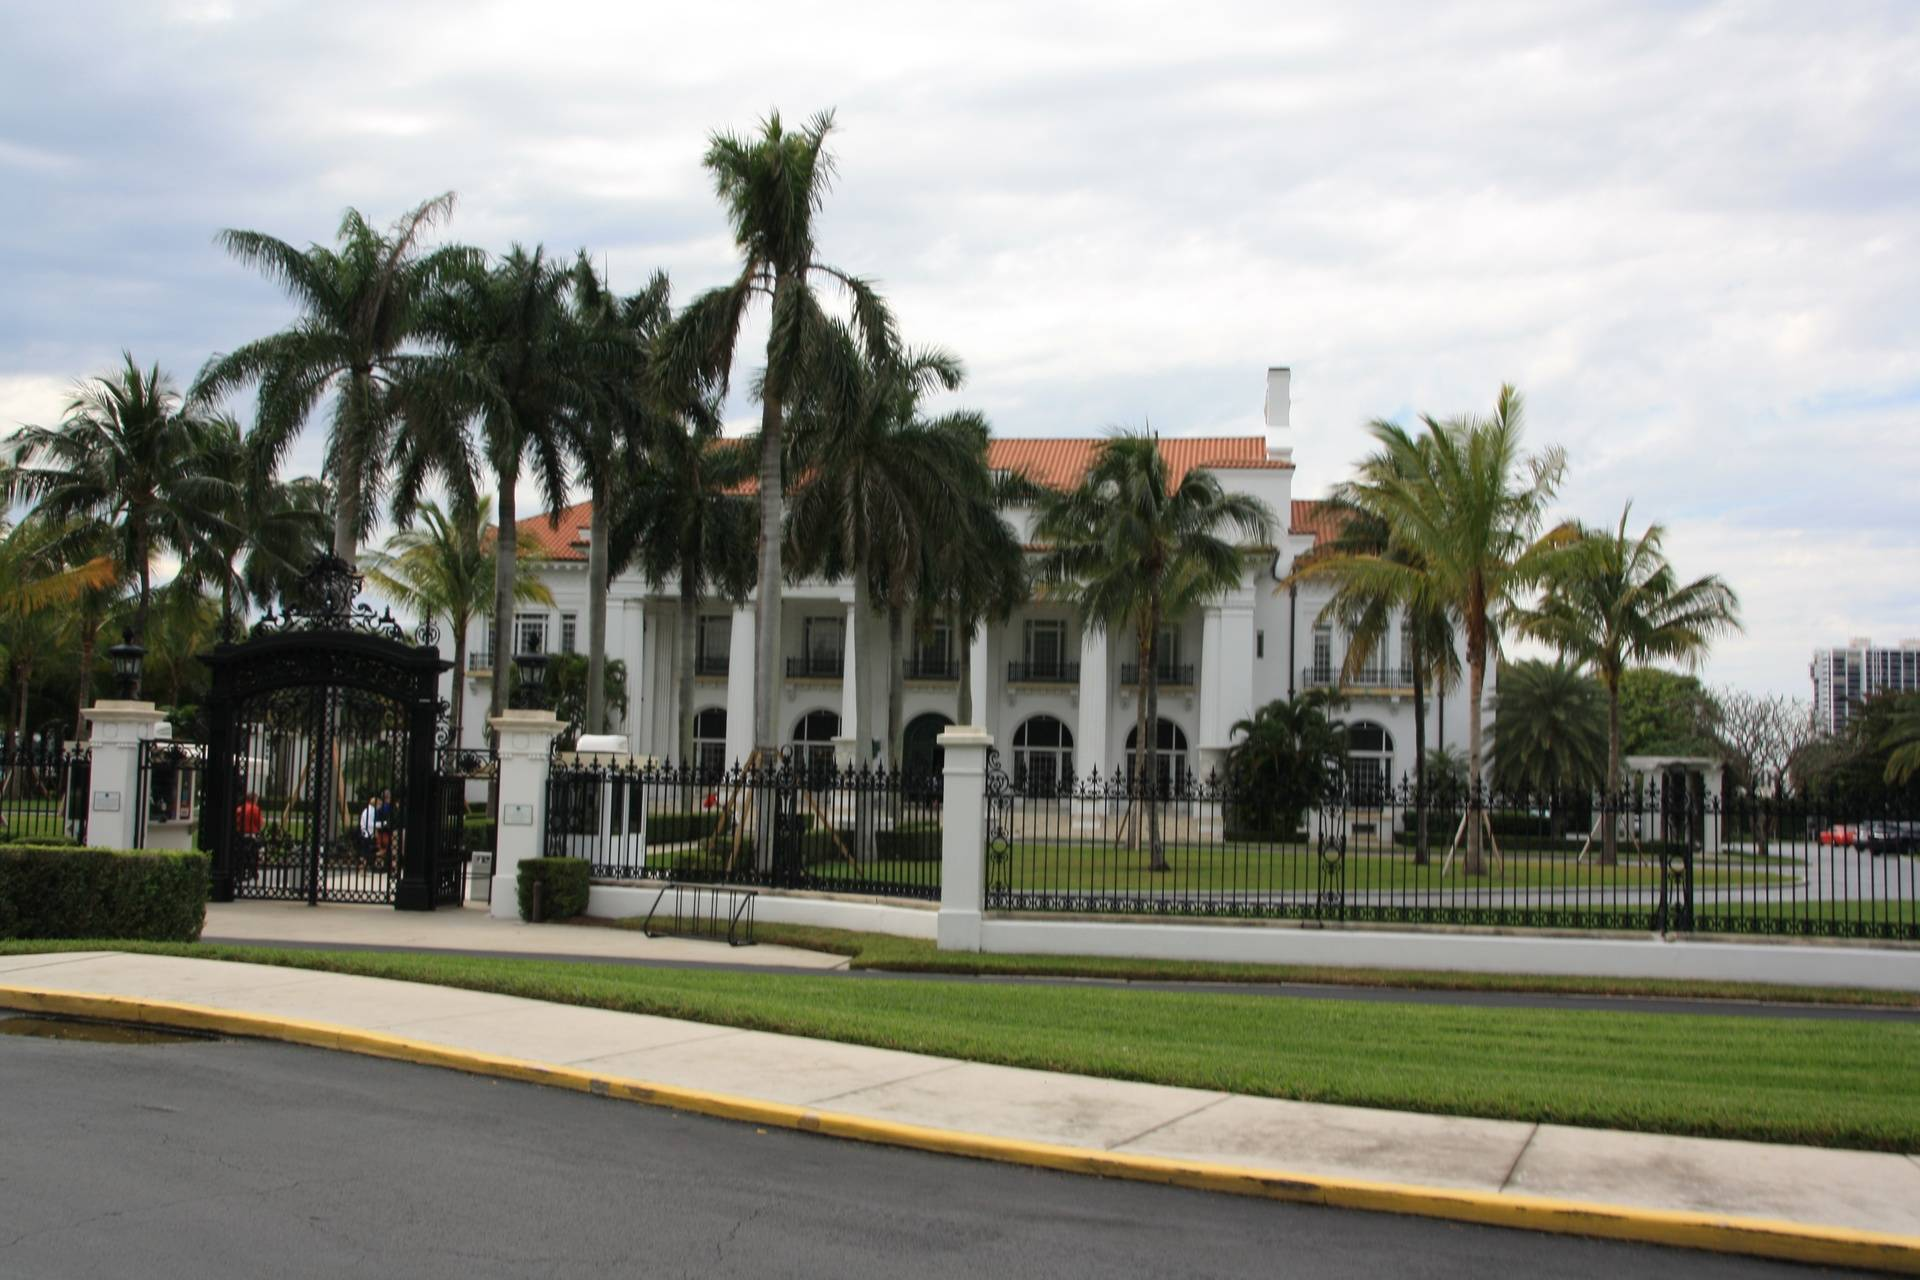 Flagler Museum, Palm Beach FL